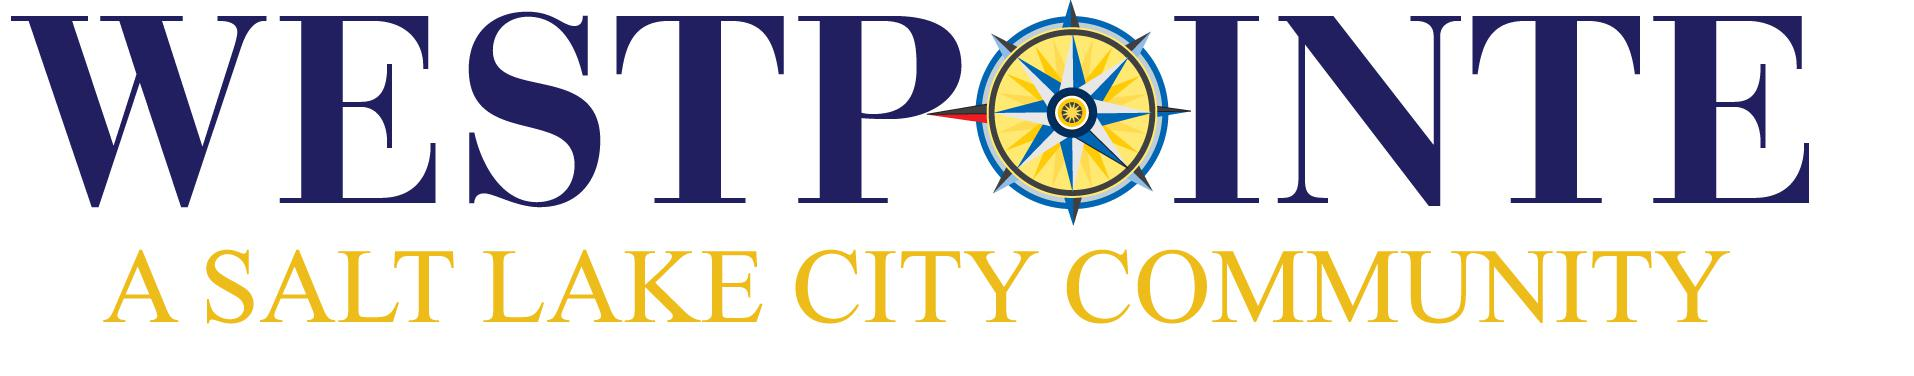 Westpointe - A Salt Lake Community